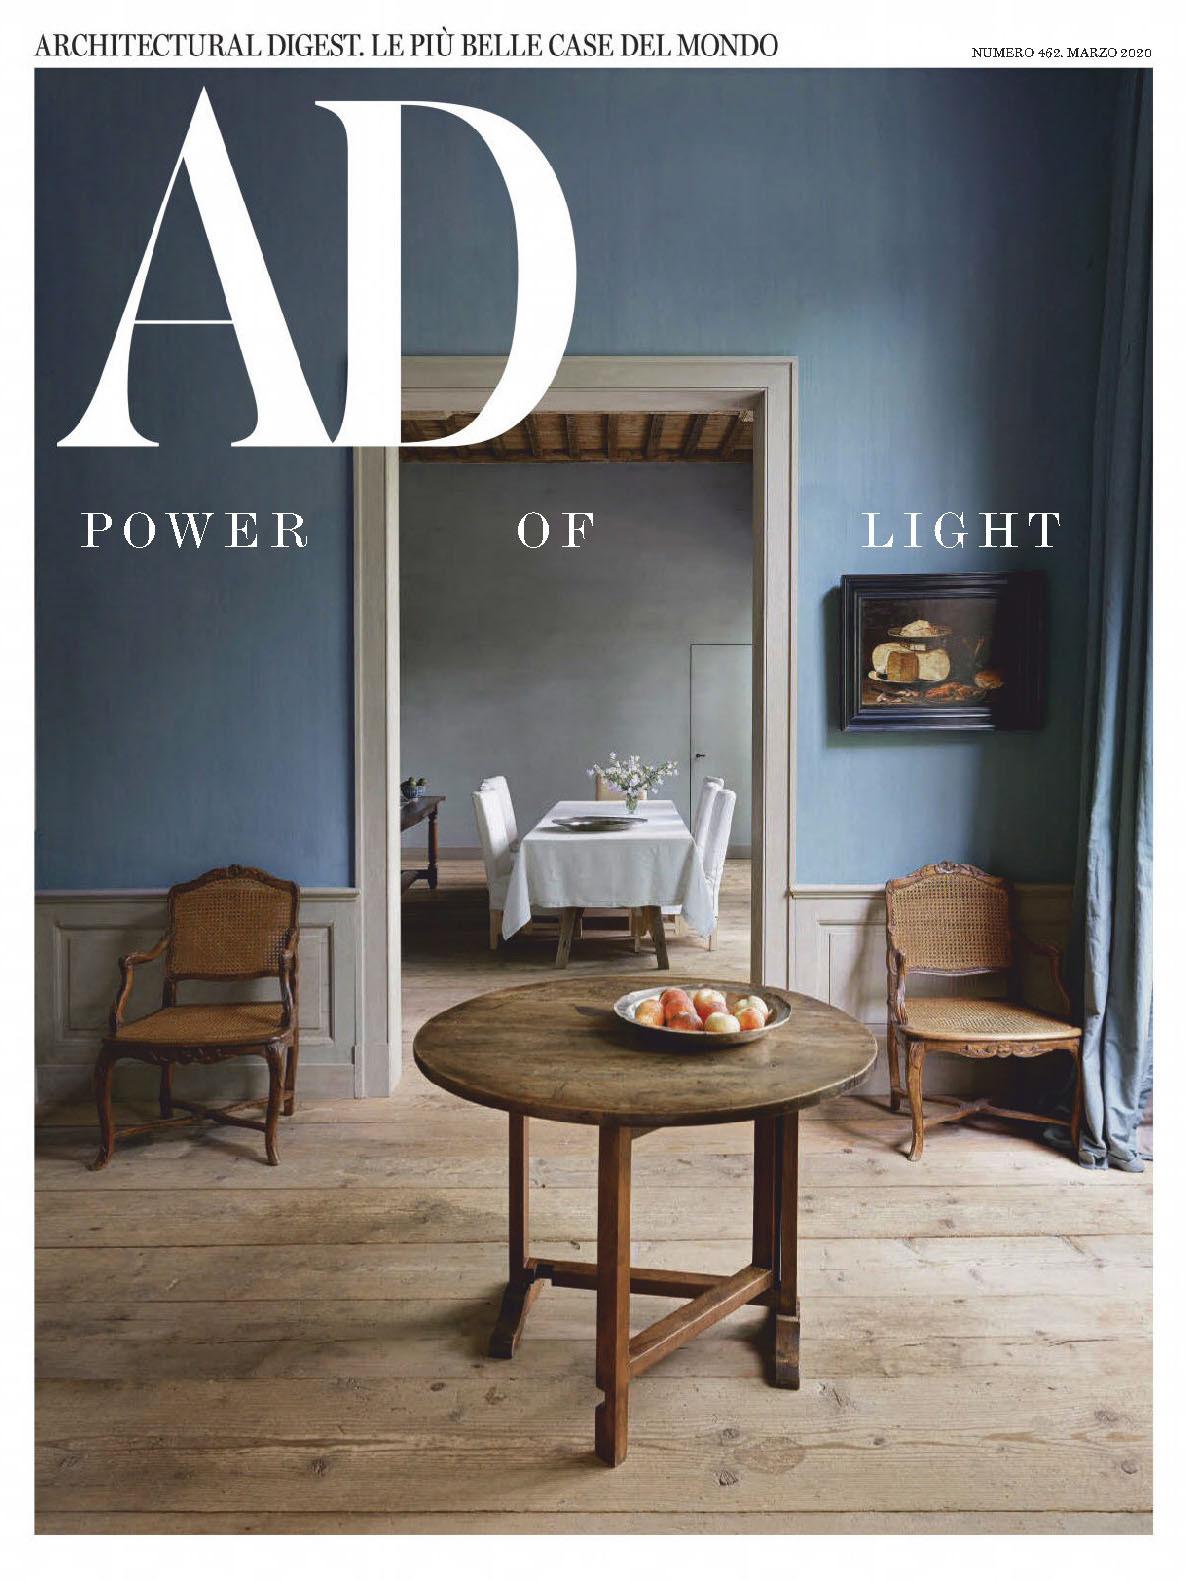 《AD》意大利版室内室外设计杂志2020年03月号